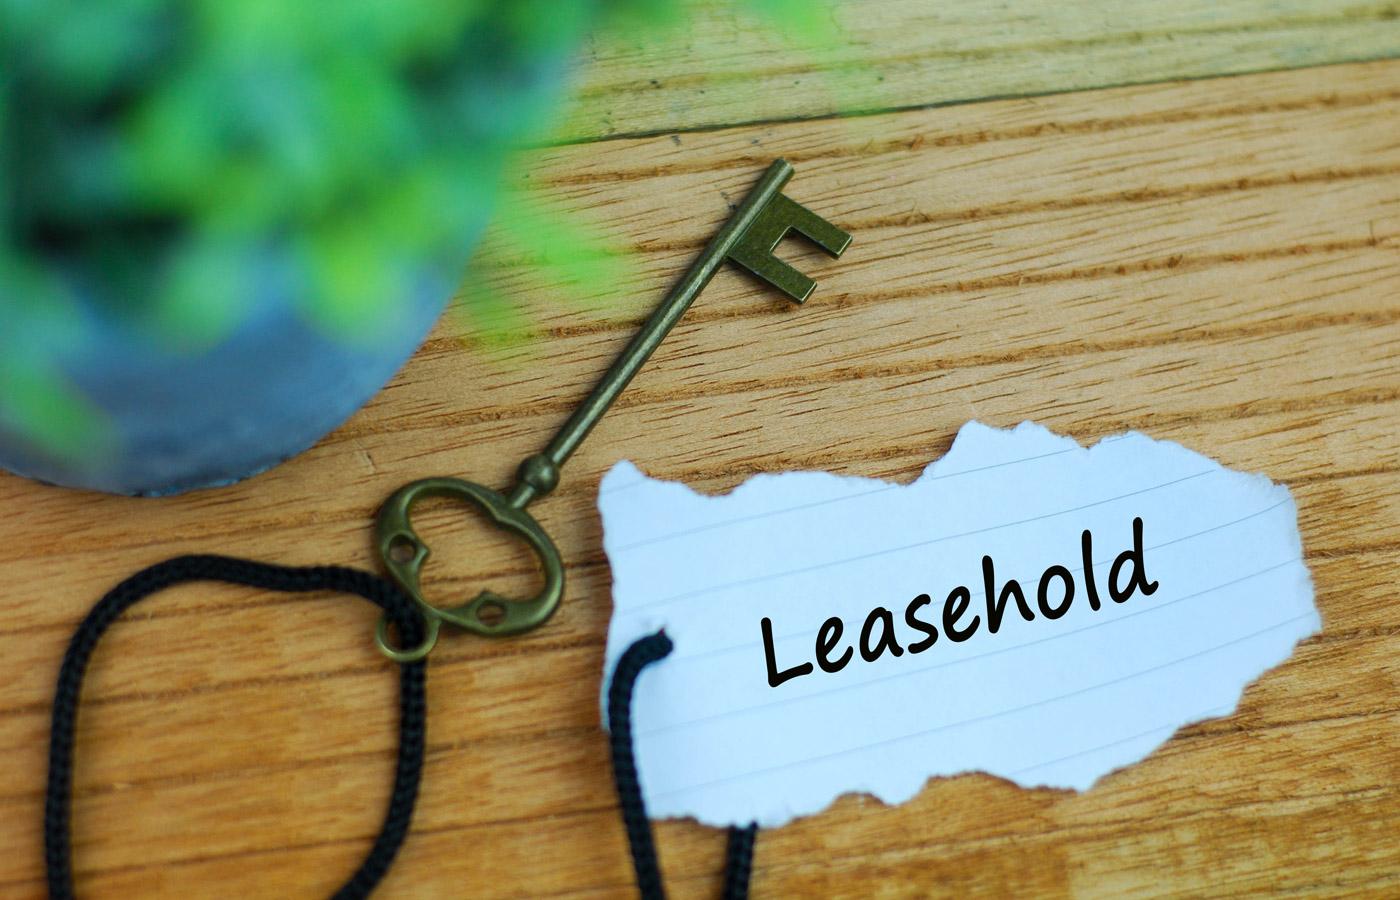 Buying leasehold property